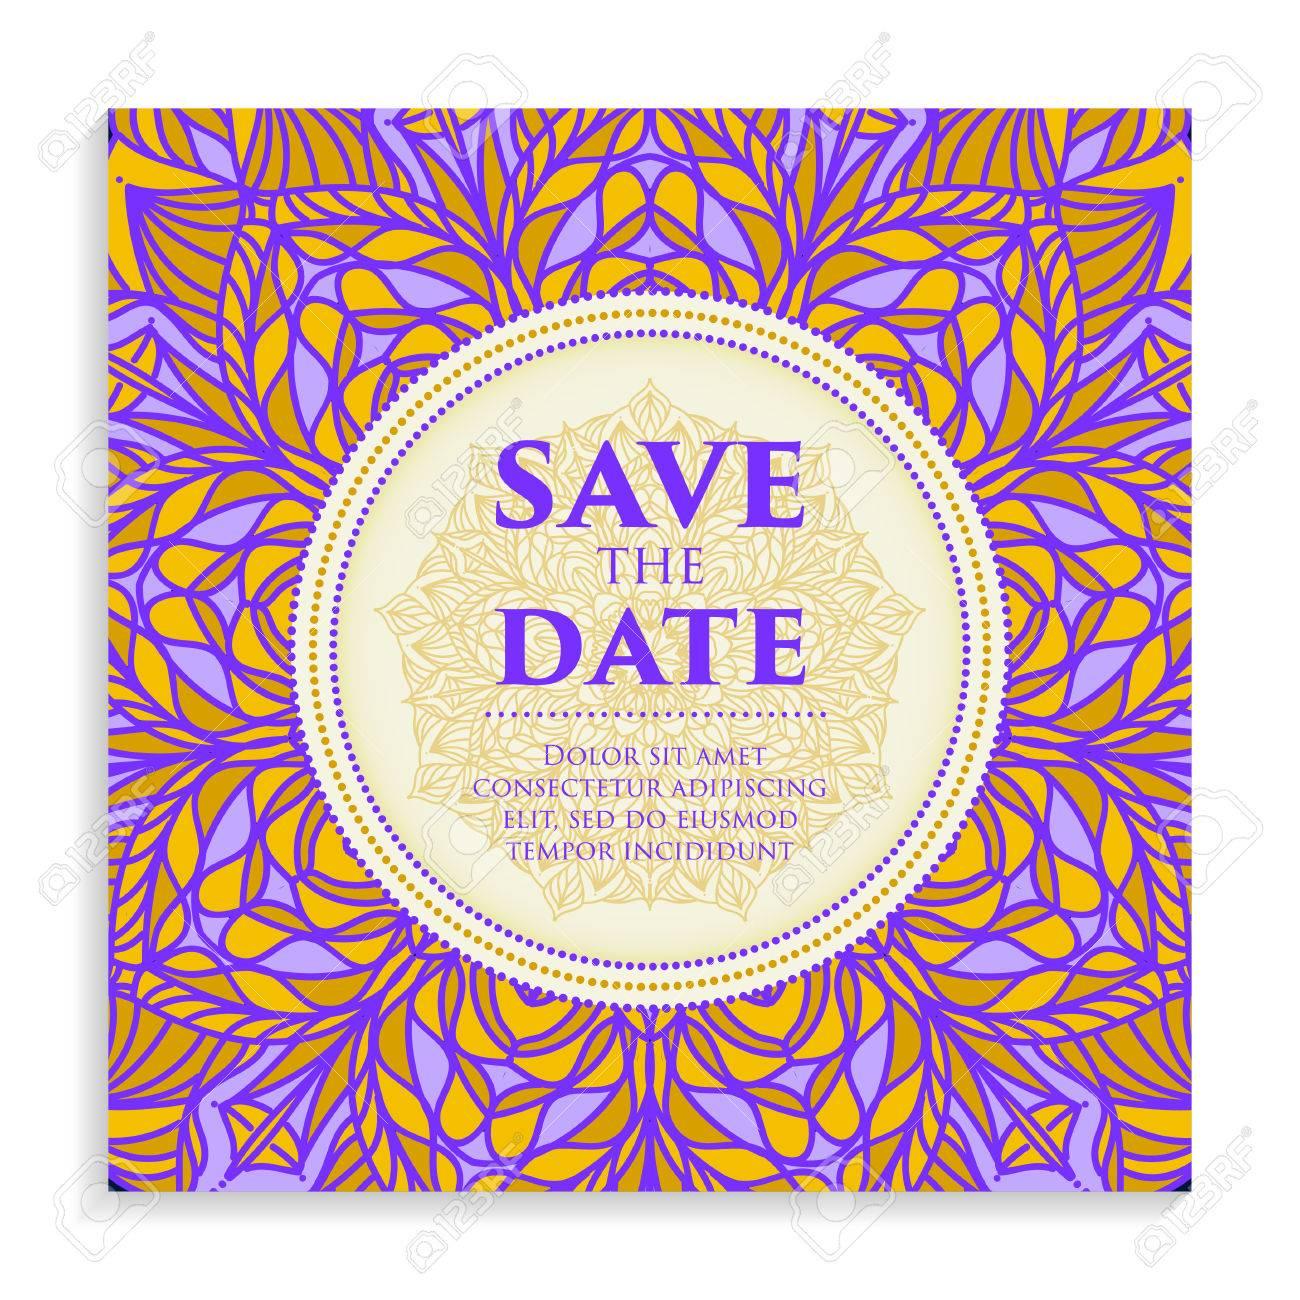 vintage template design layout for wedding invitation wedding